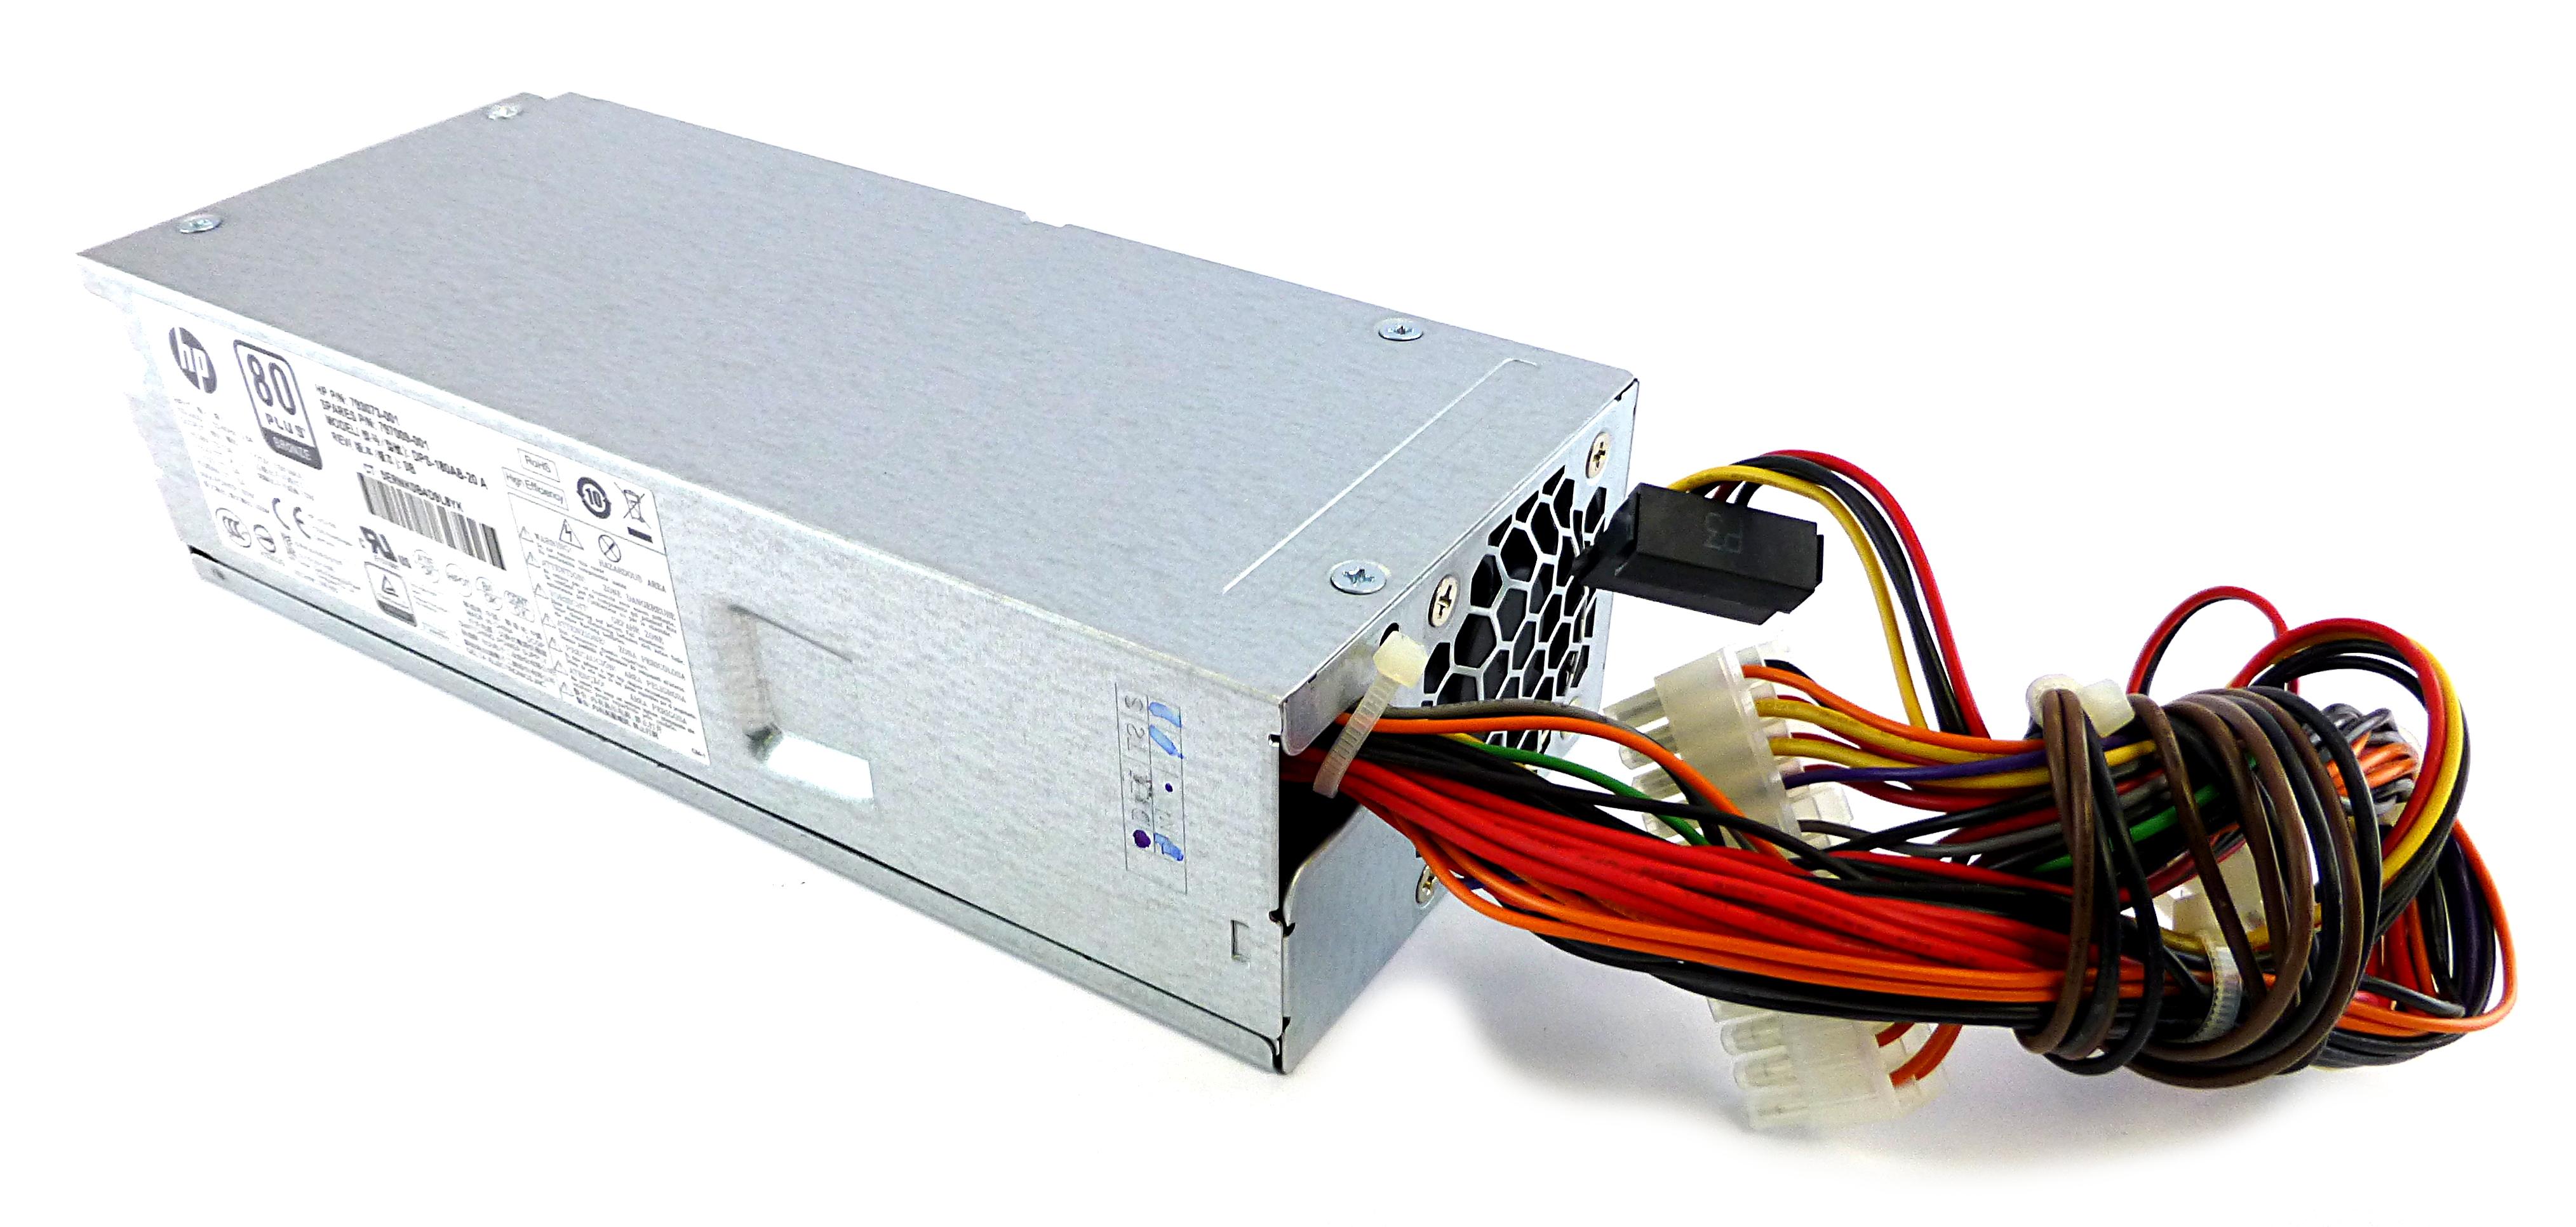 793073-001 DPS-180AB-20 A HP 180W Desktop Power Supply 797009-001